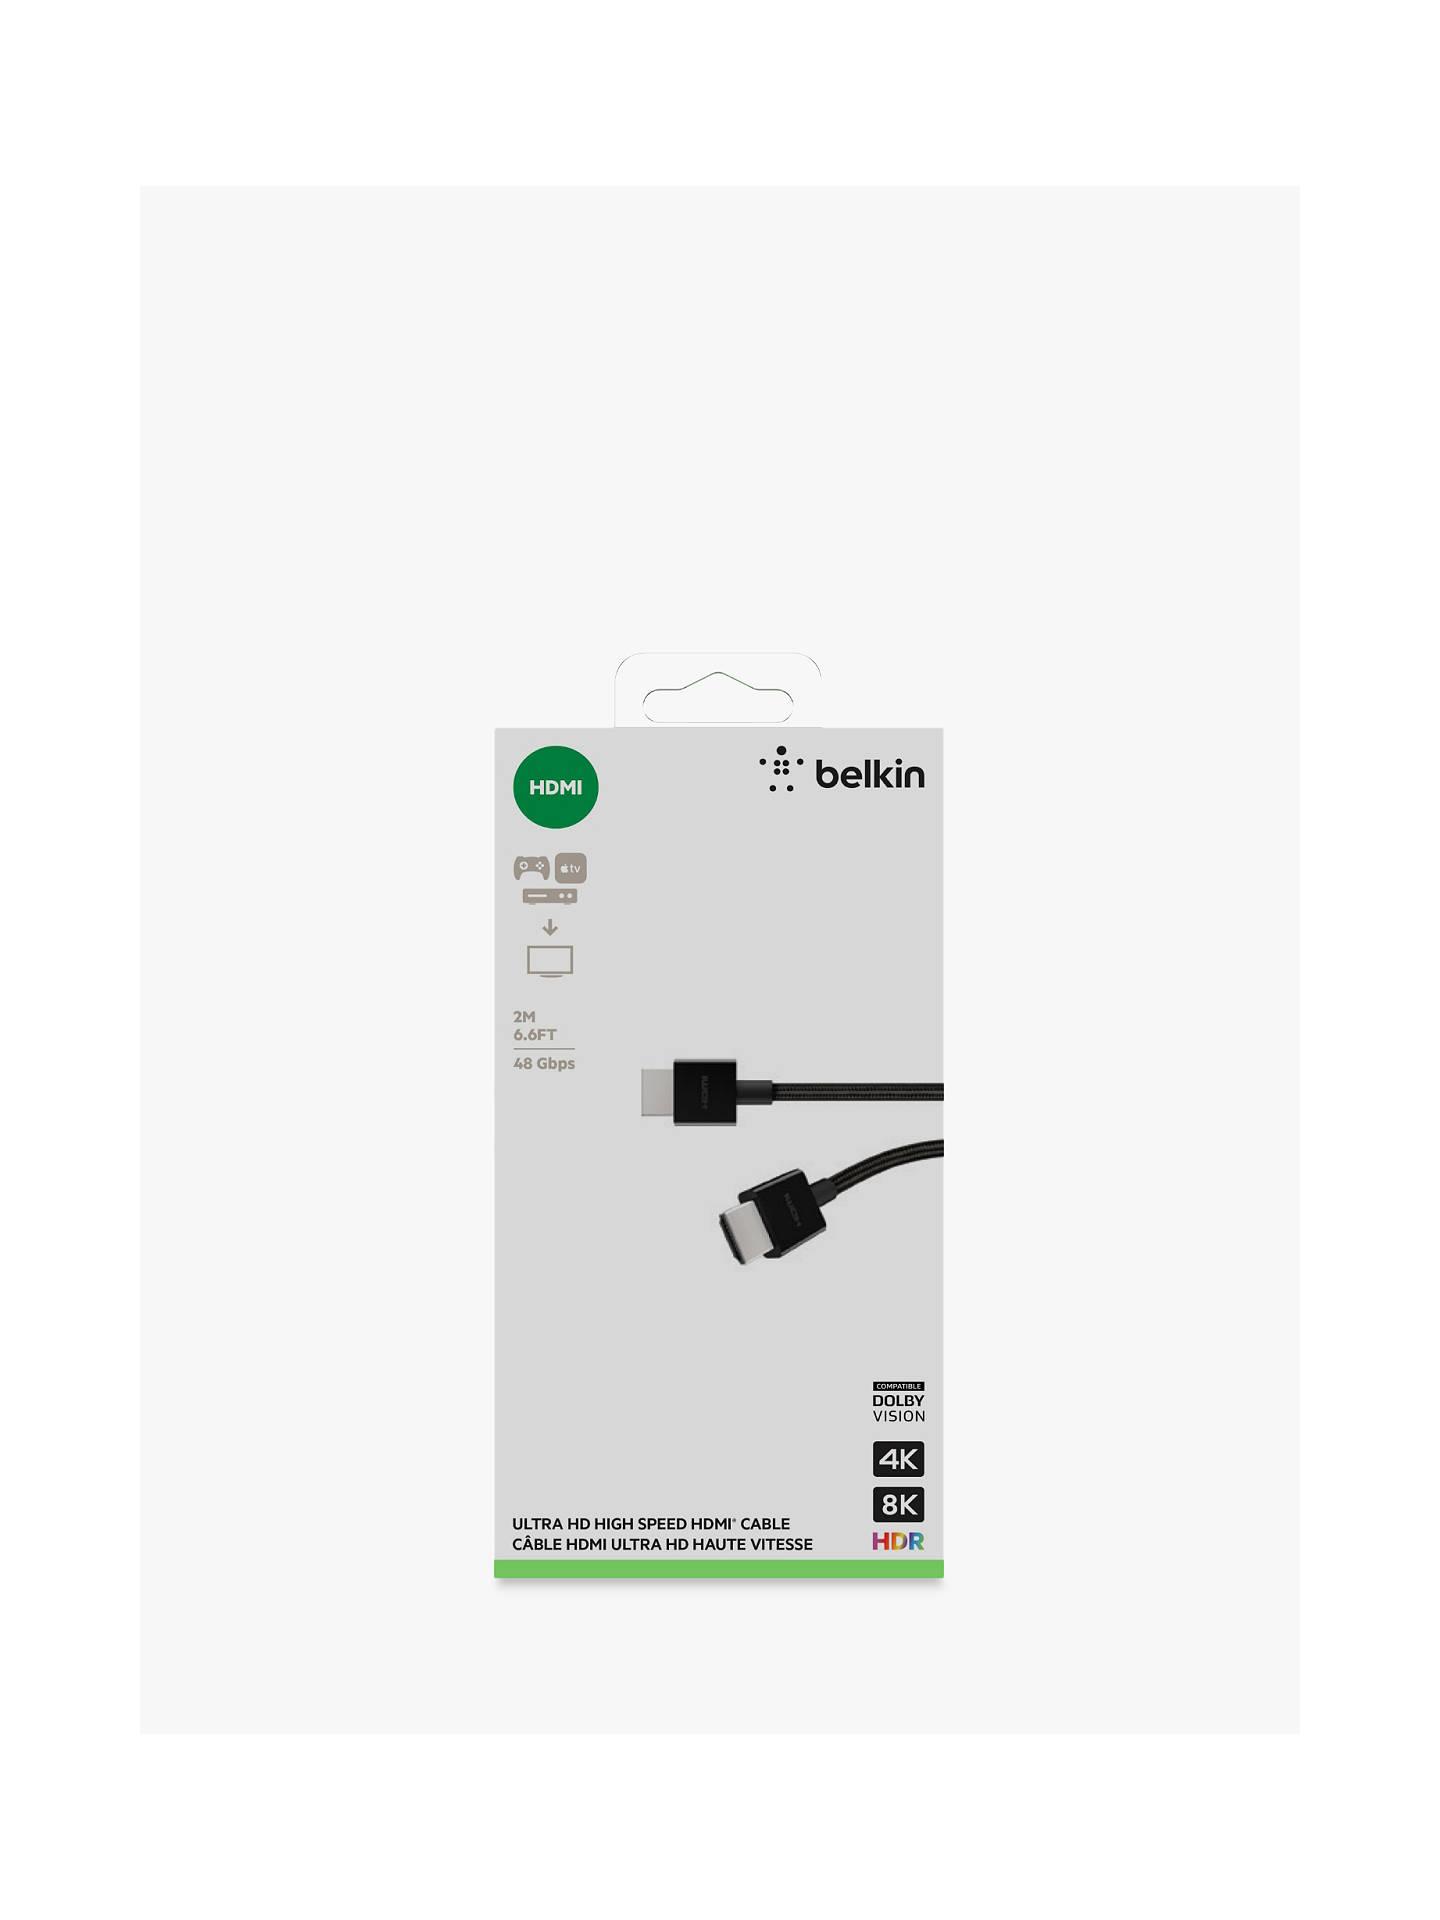 belkin hdmi 2.1  Belkin 4K HDMI 2.1 Cable, 2m, Black at John Lewis & Partners